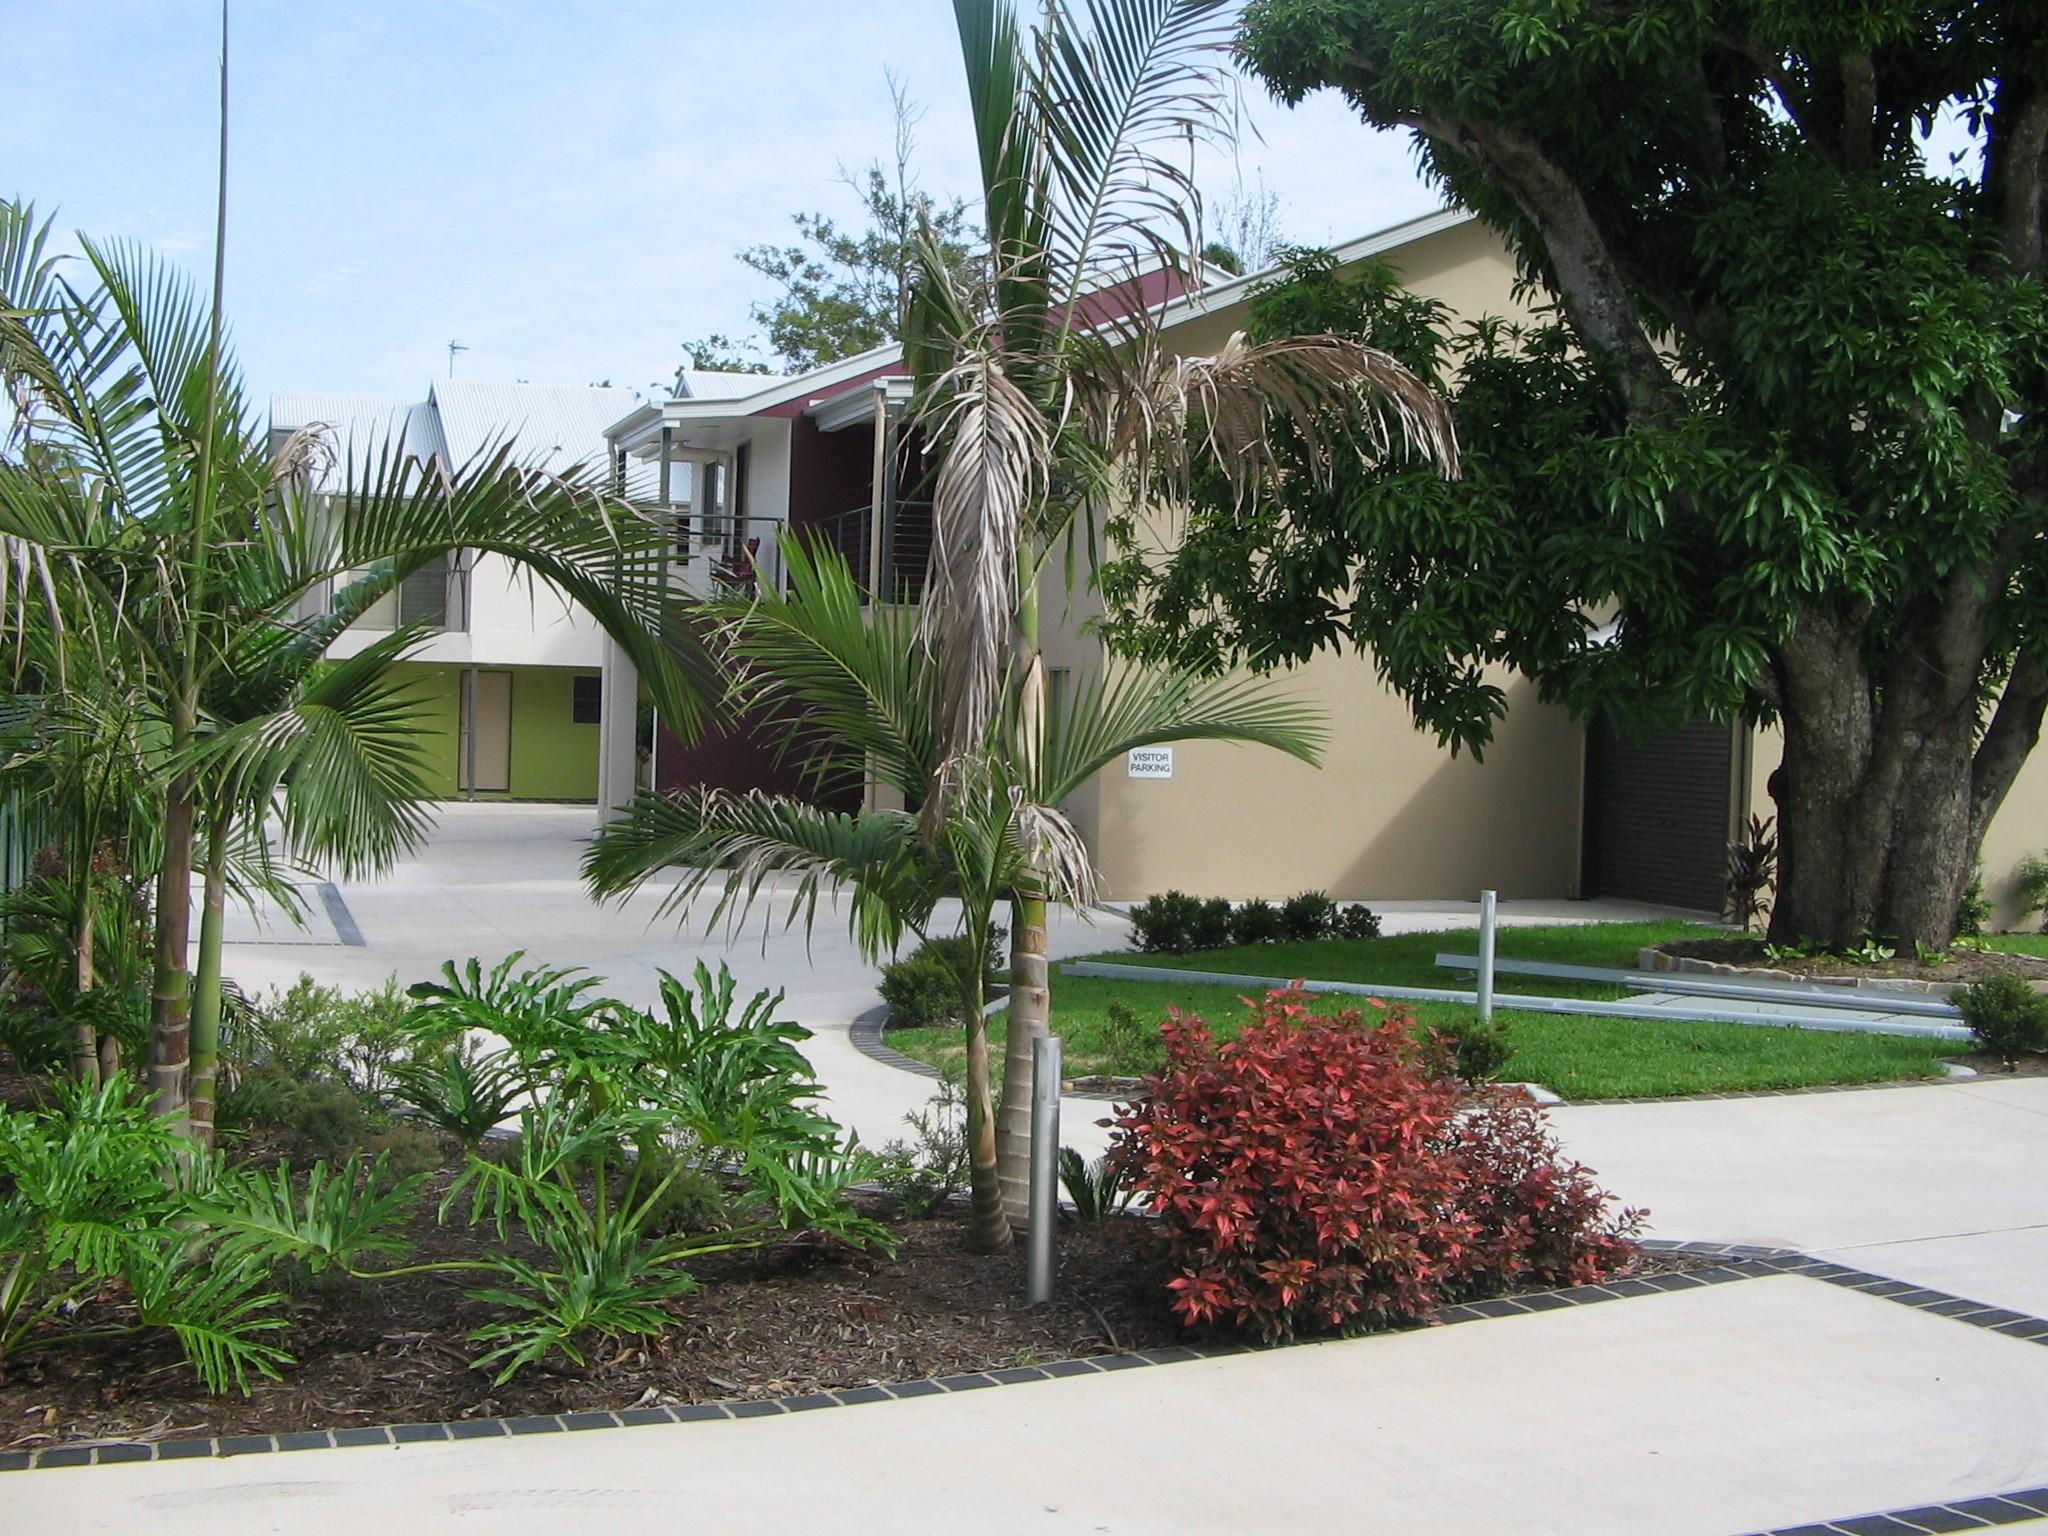 Central Landscape And Garden Drury : Central landscaping